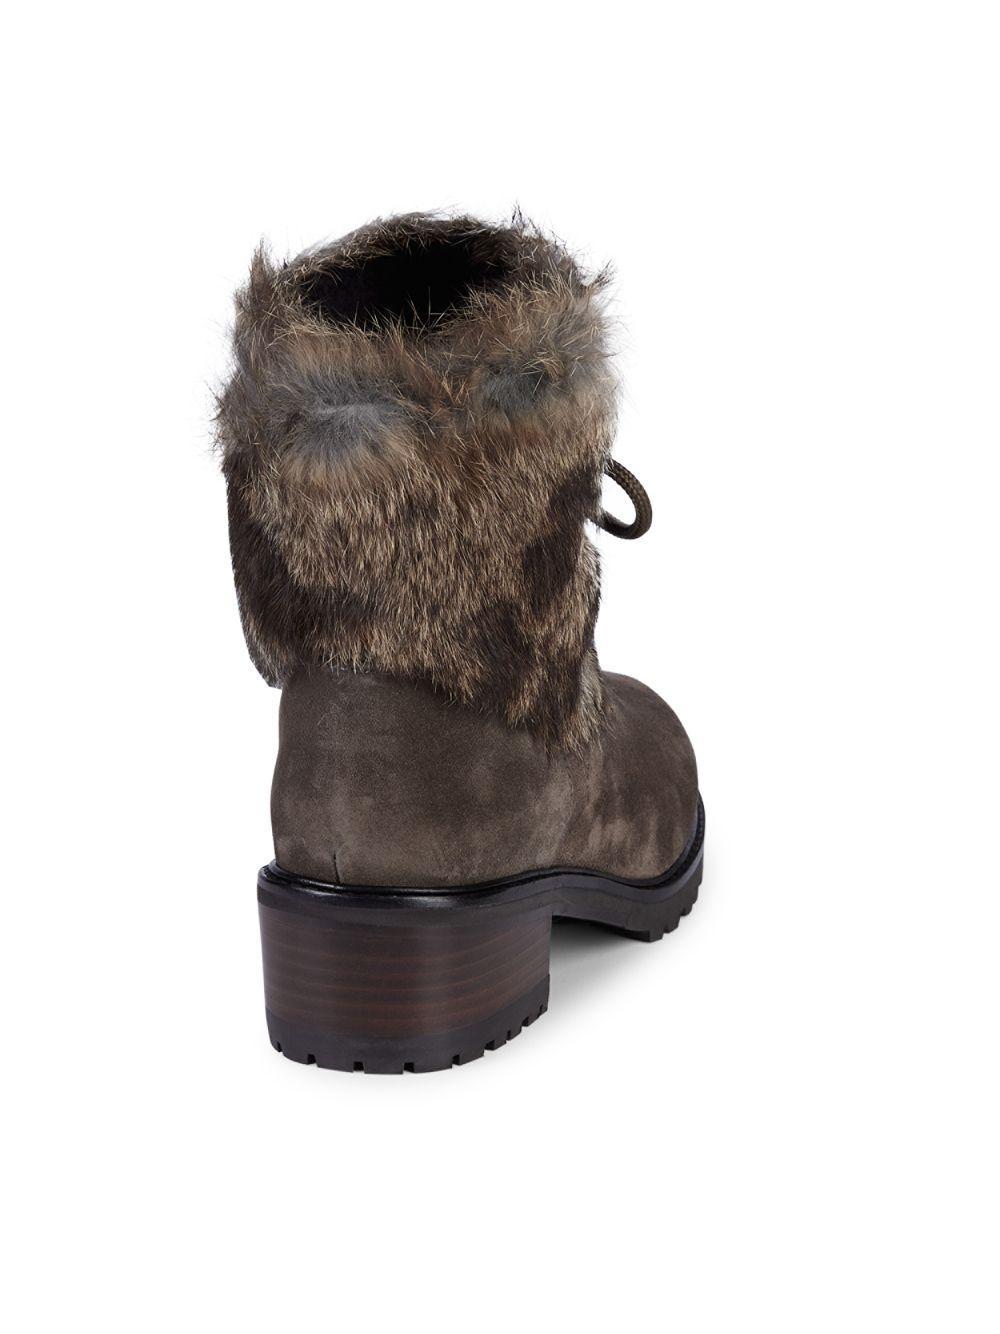 38dbefc821b Stuart Weitzman Furnace Mink Fur   Suede Lace-up Booties in Gray - Lyst